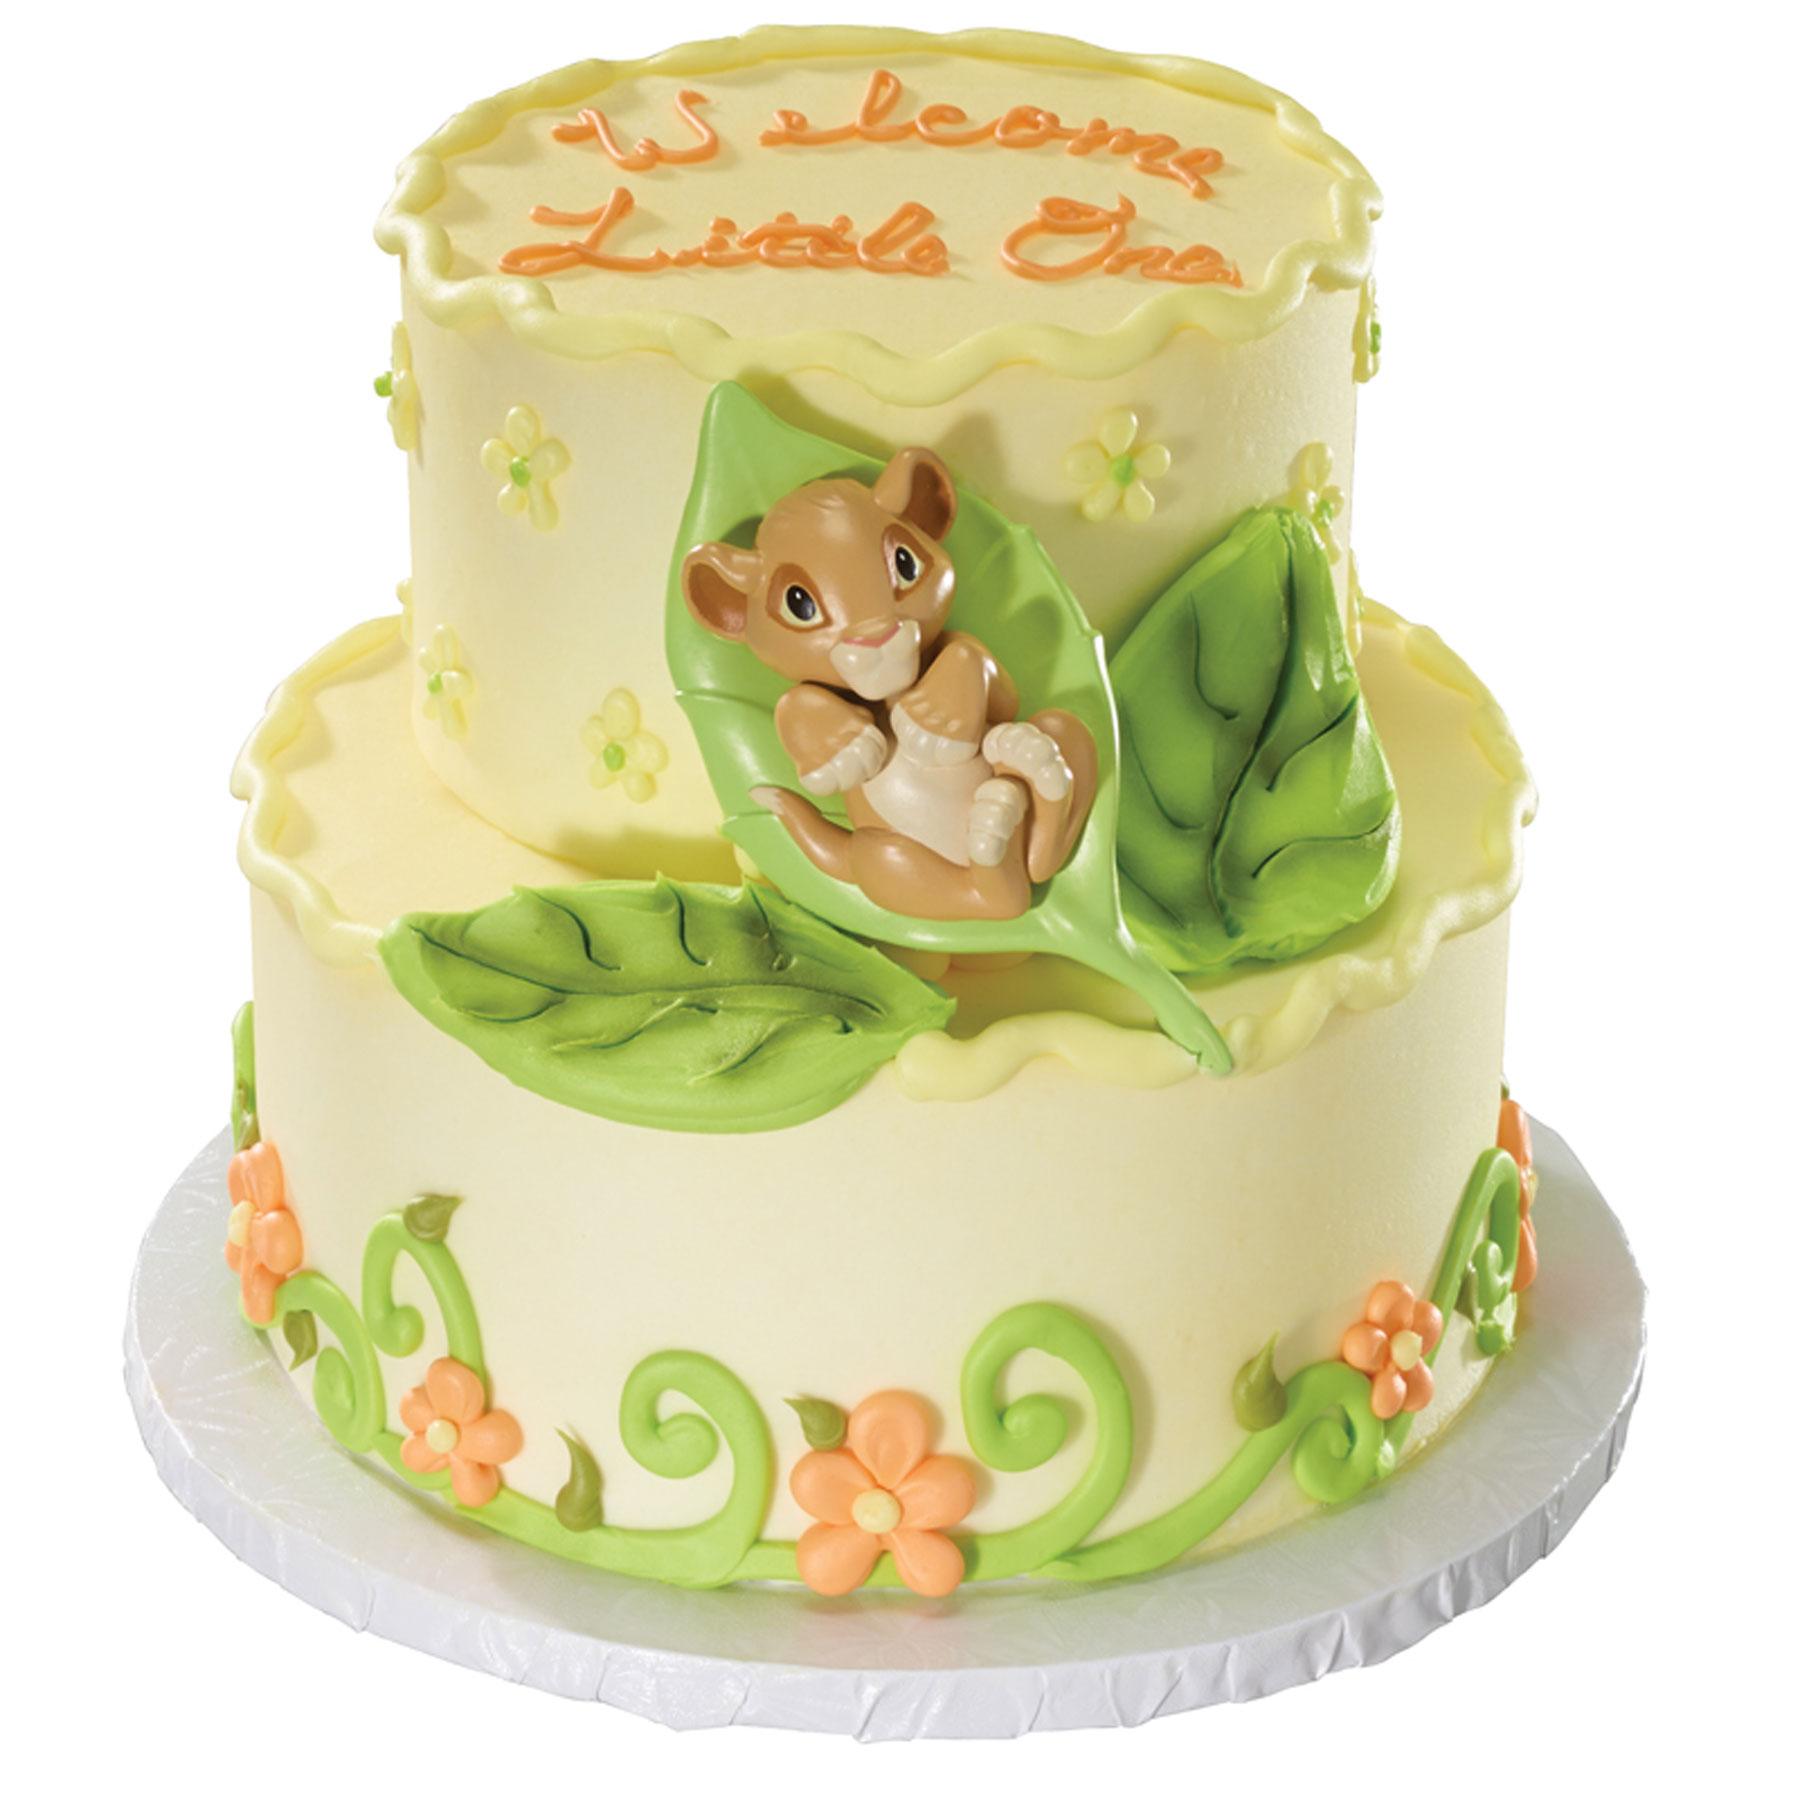 Brilliant Simba Cakes Decoration Ideas Little Birthday Cakes Funny Birthday Cards Online Bapapcheapnameinfo